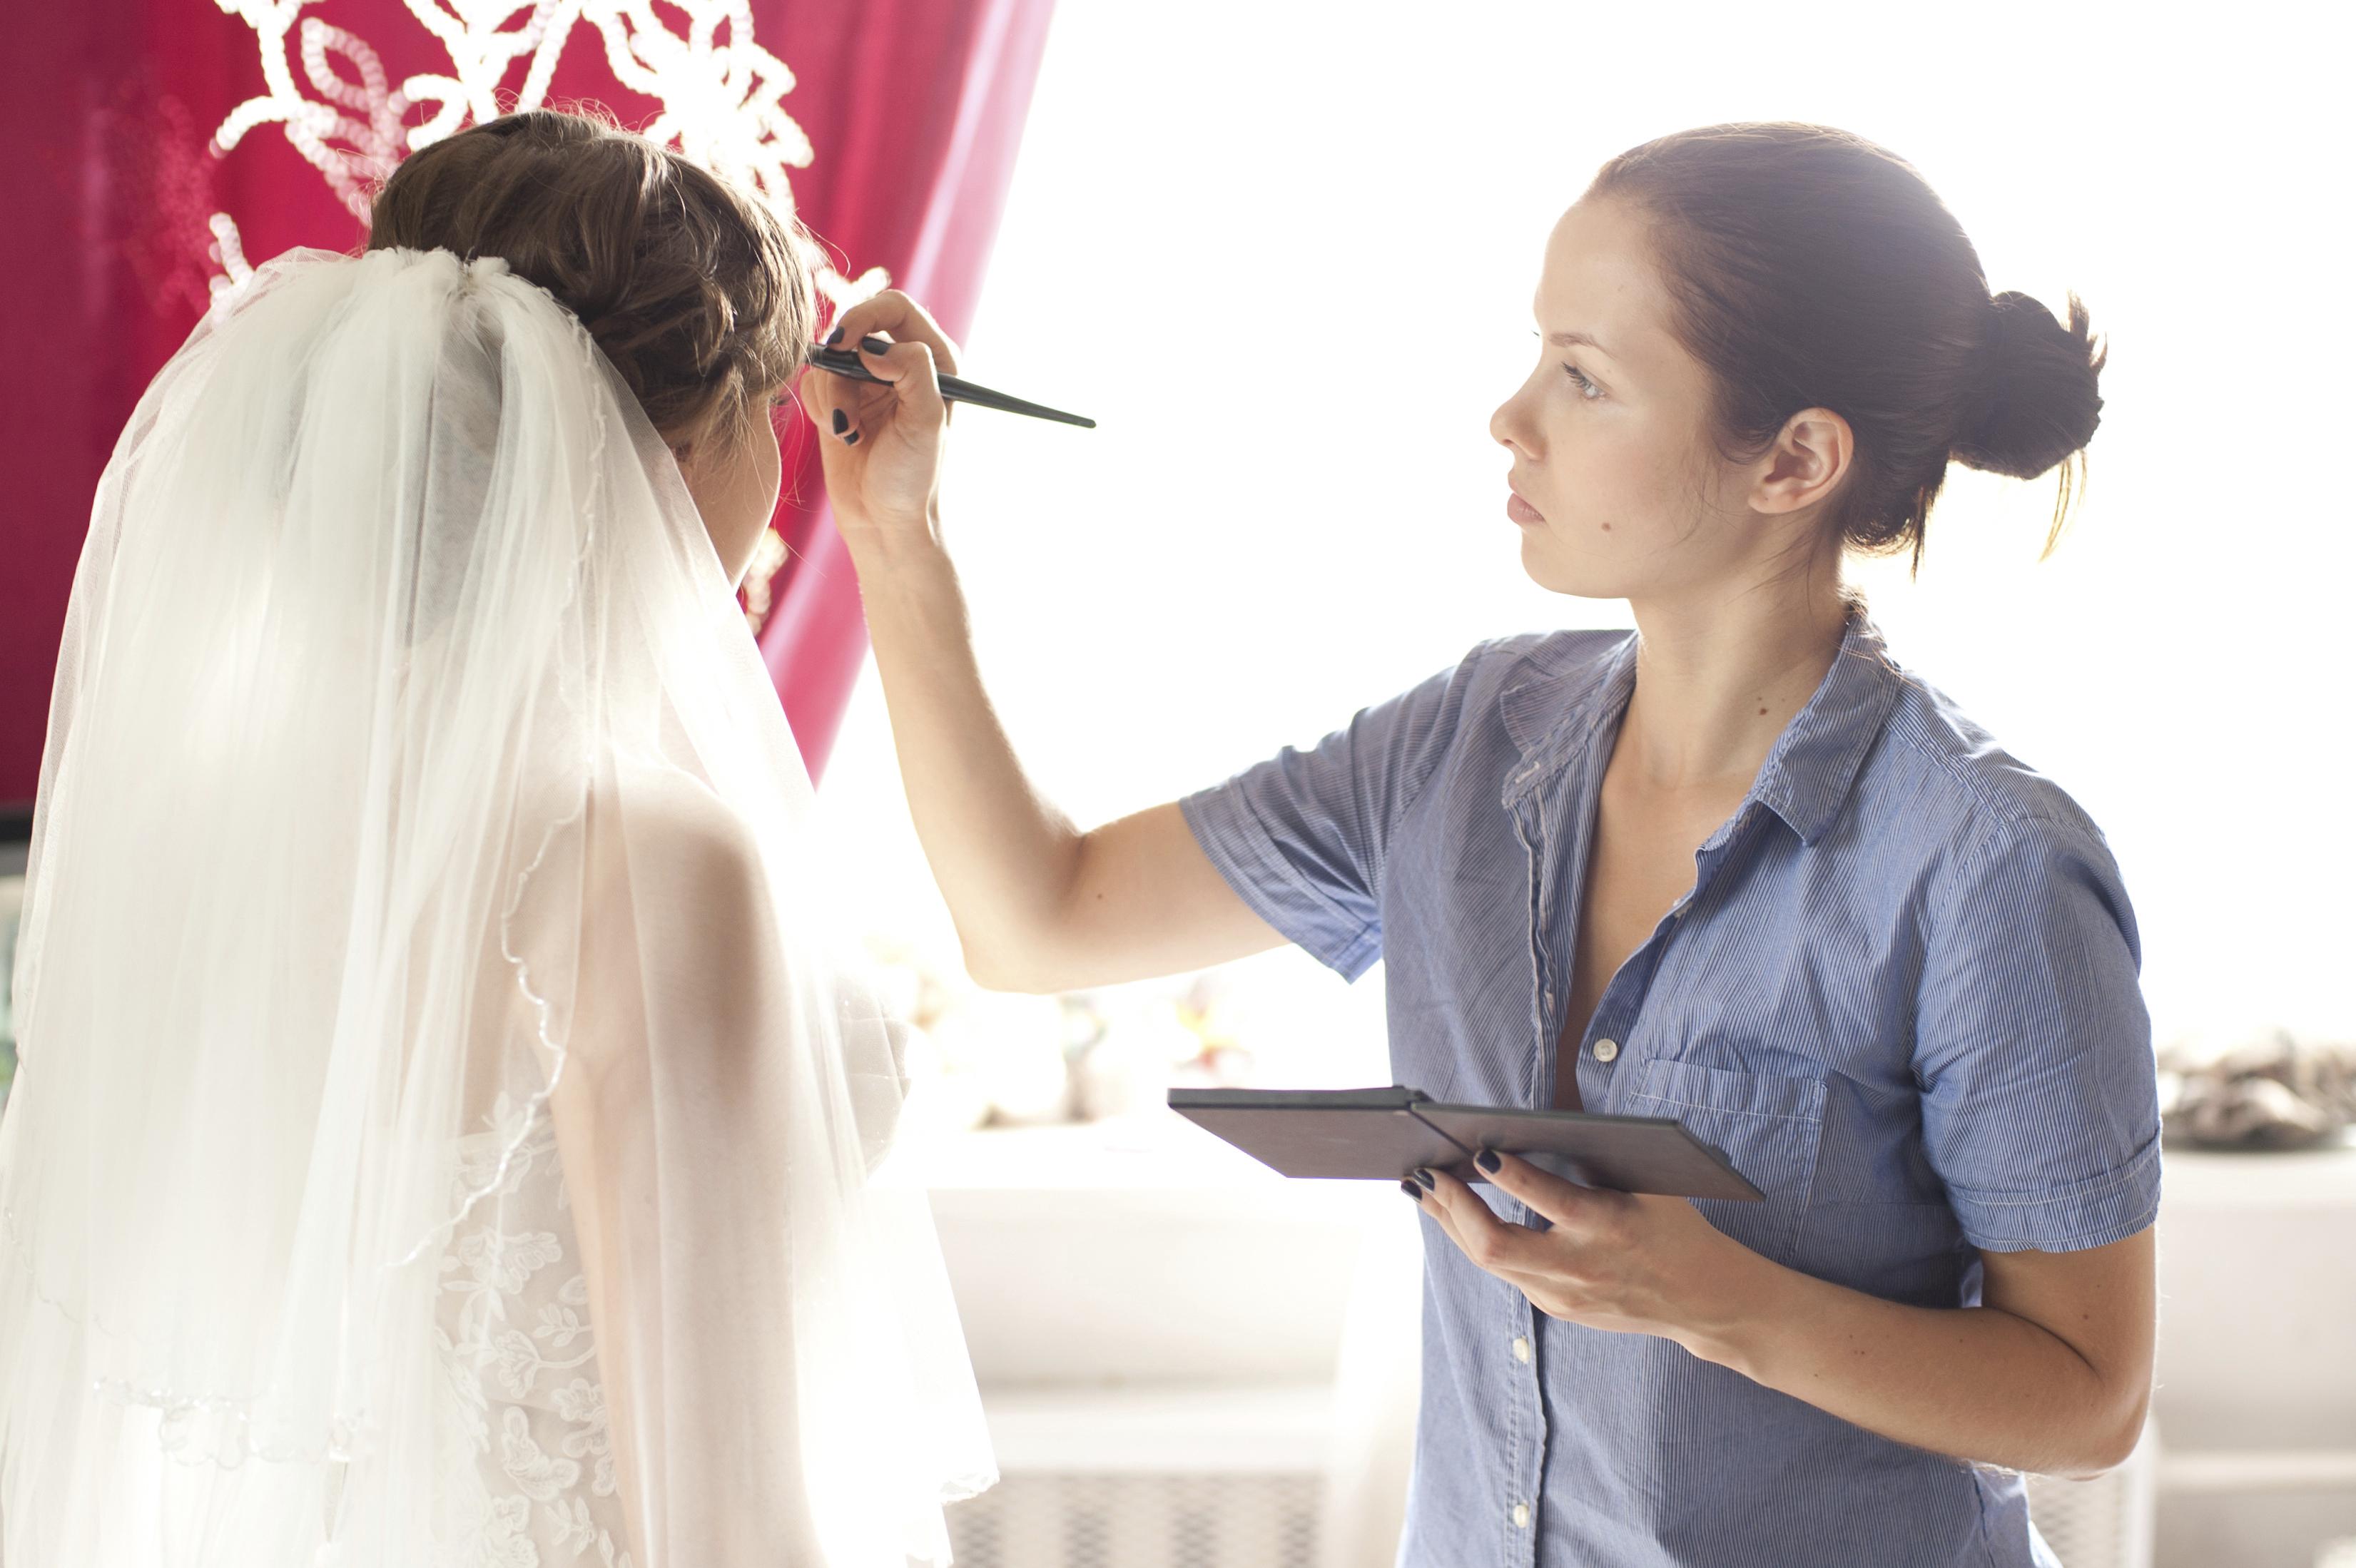 Bridal makeup artist - Articles - Easy Weddings